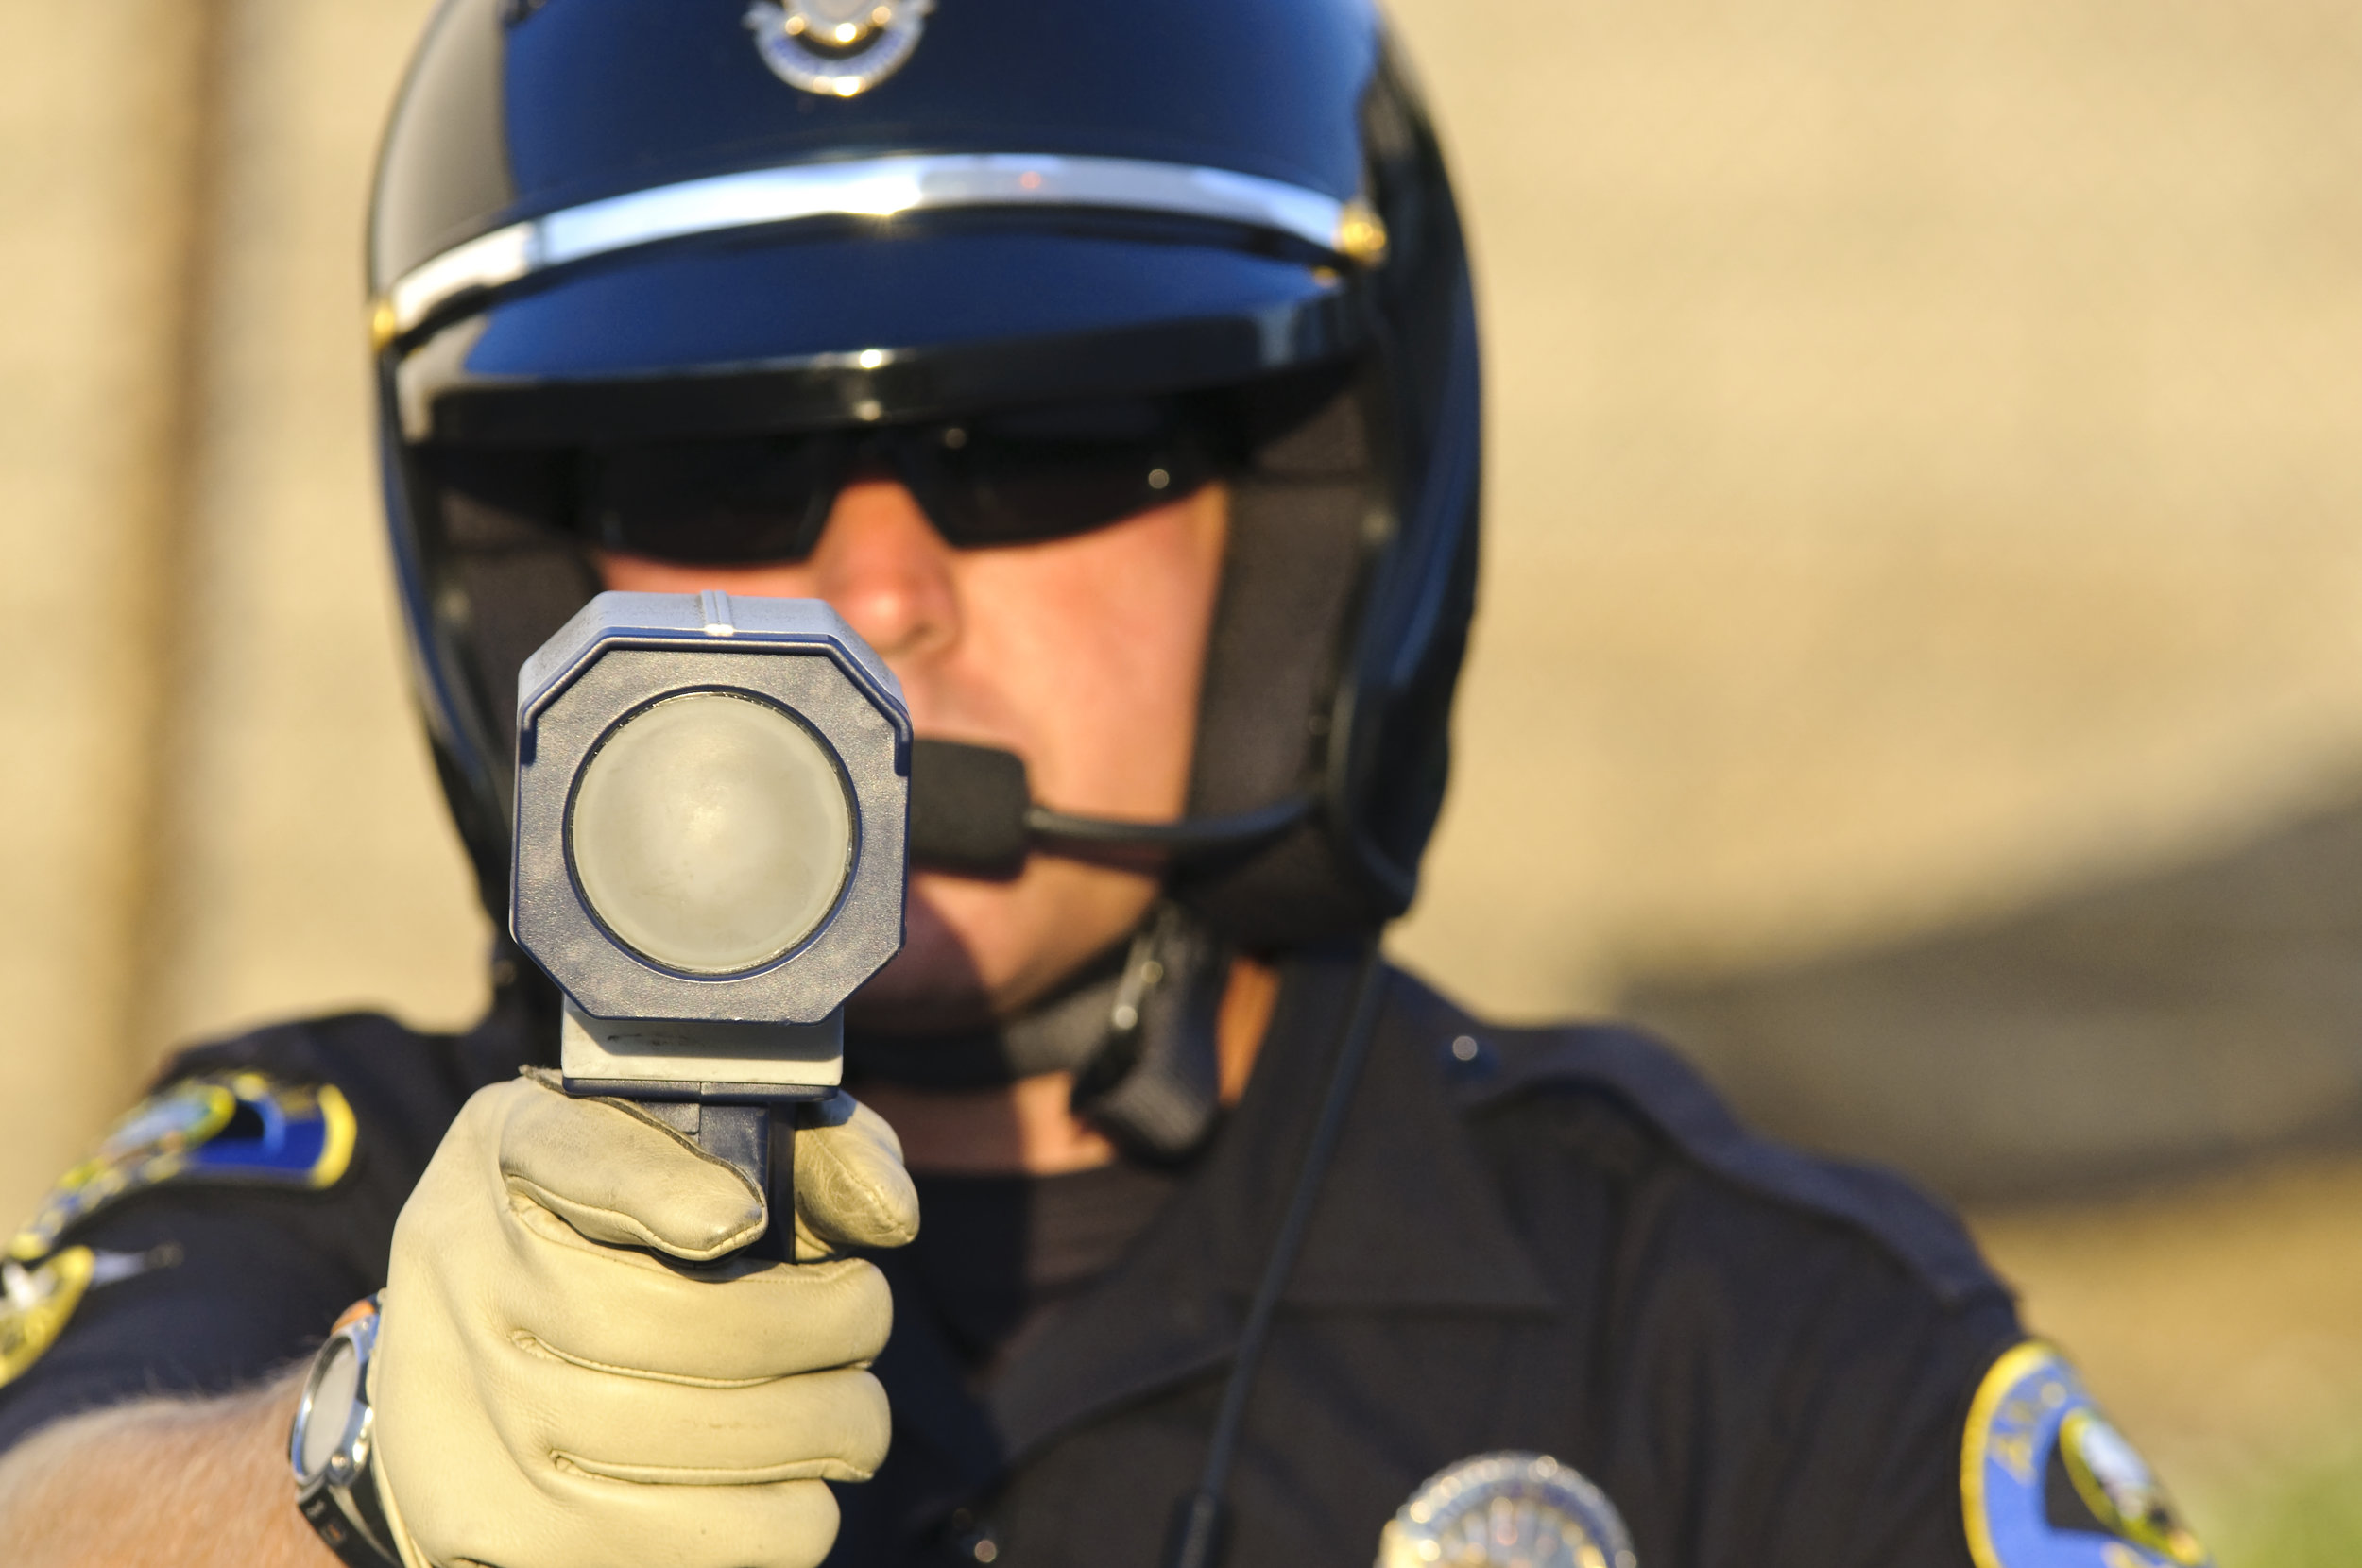 shutterstock_cop pointing radar gun.jpg